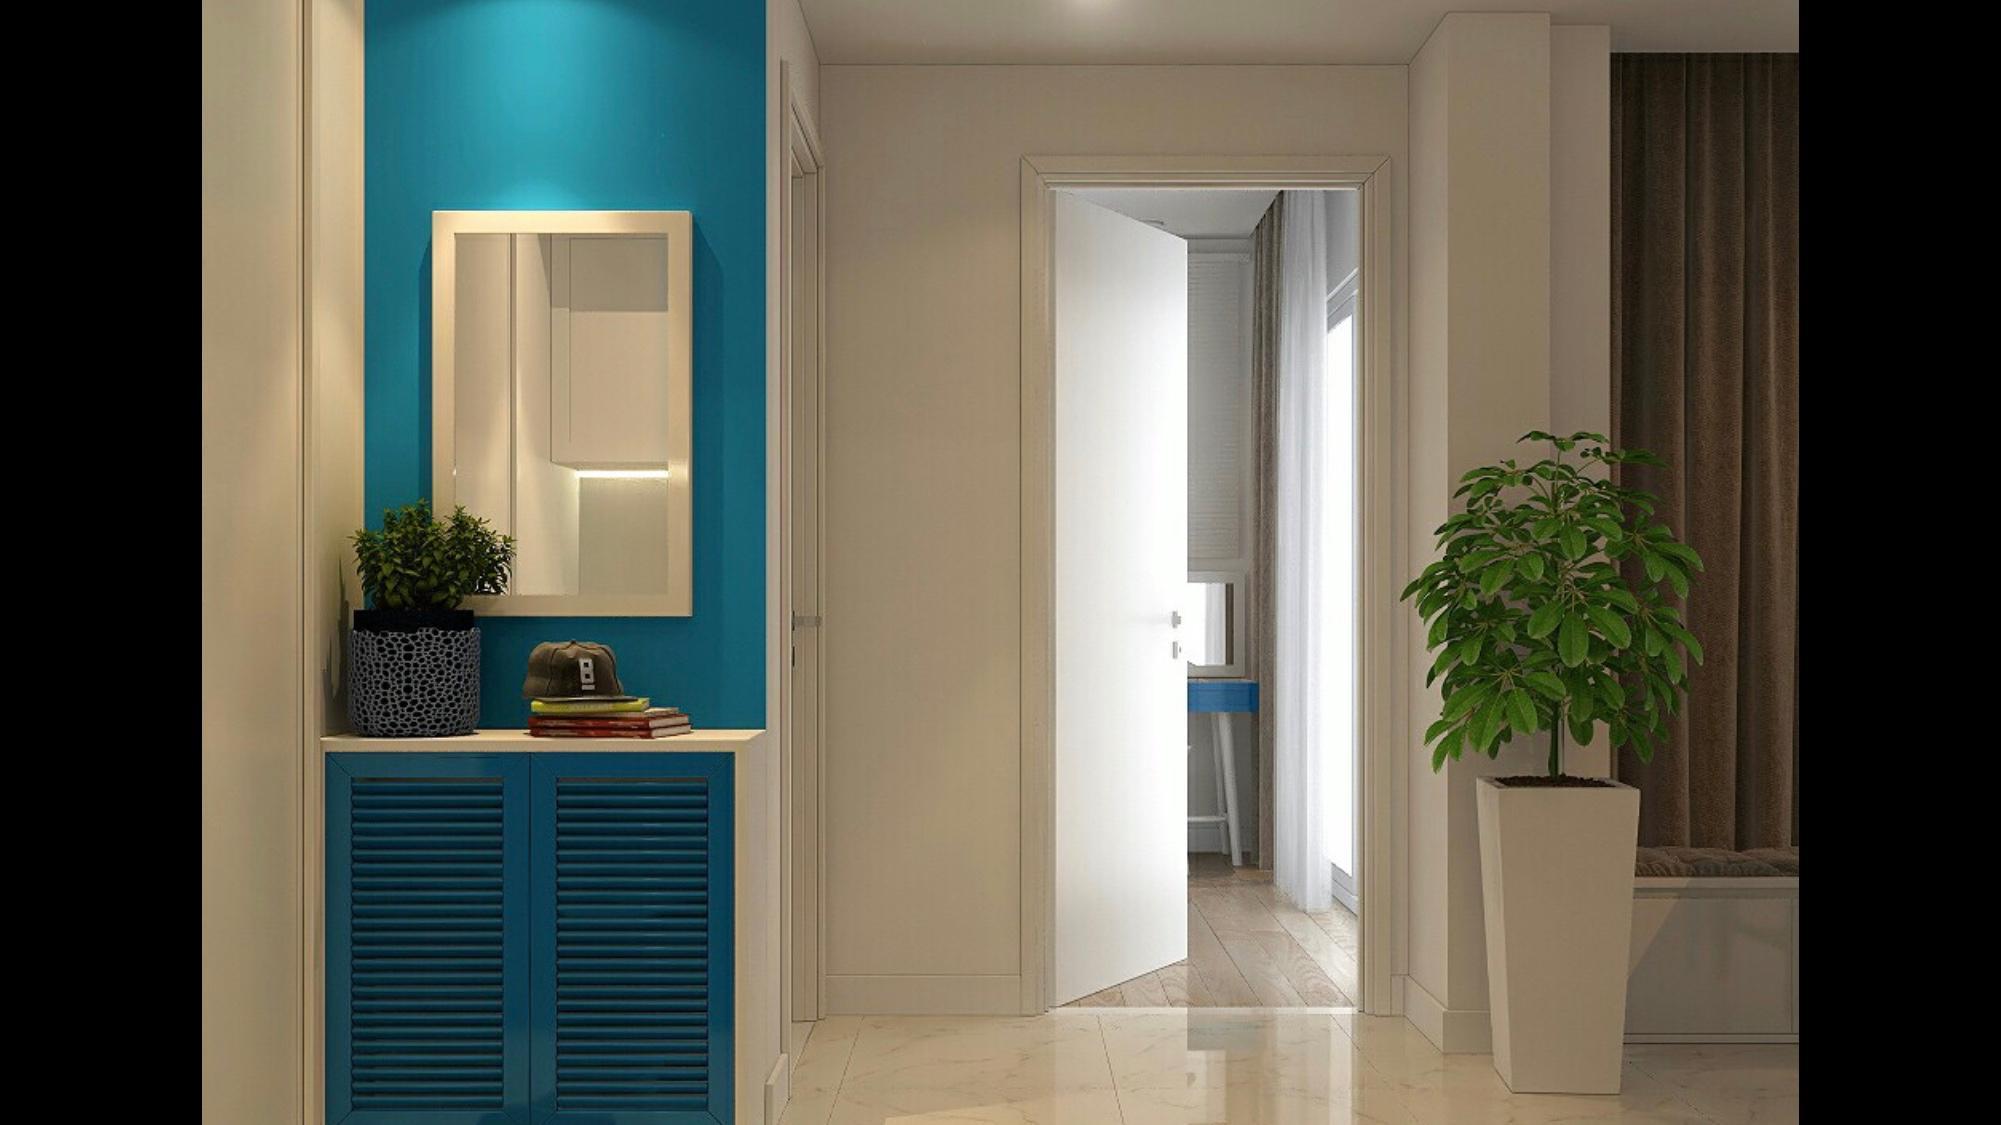 Estar Apartment For Rent